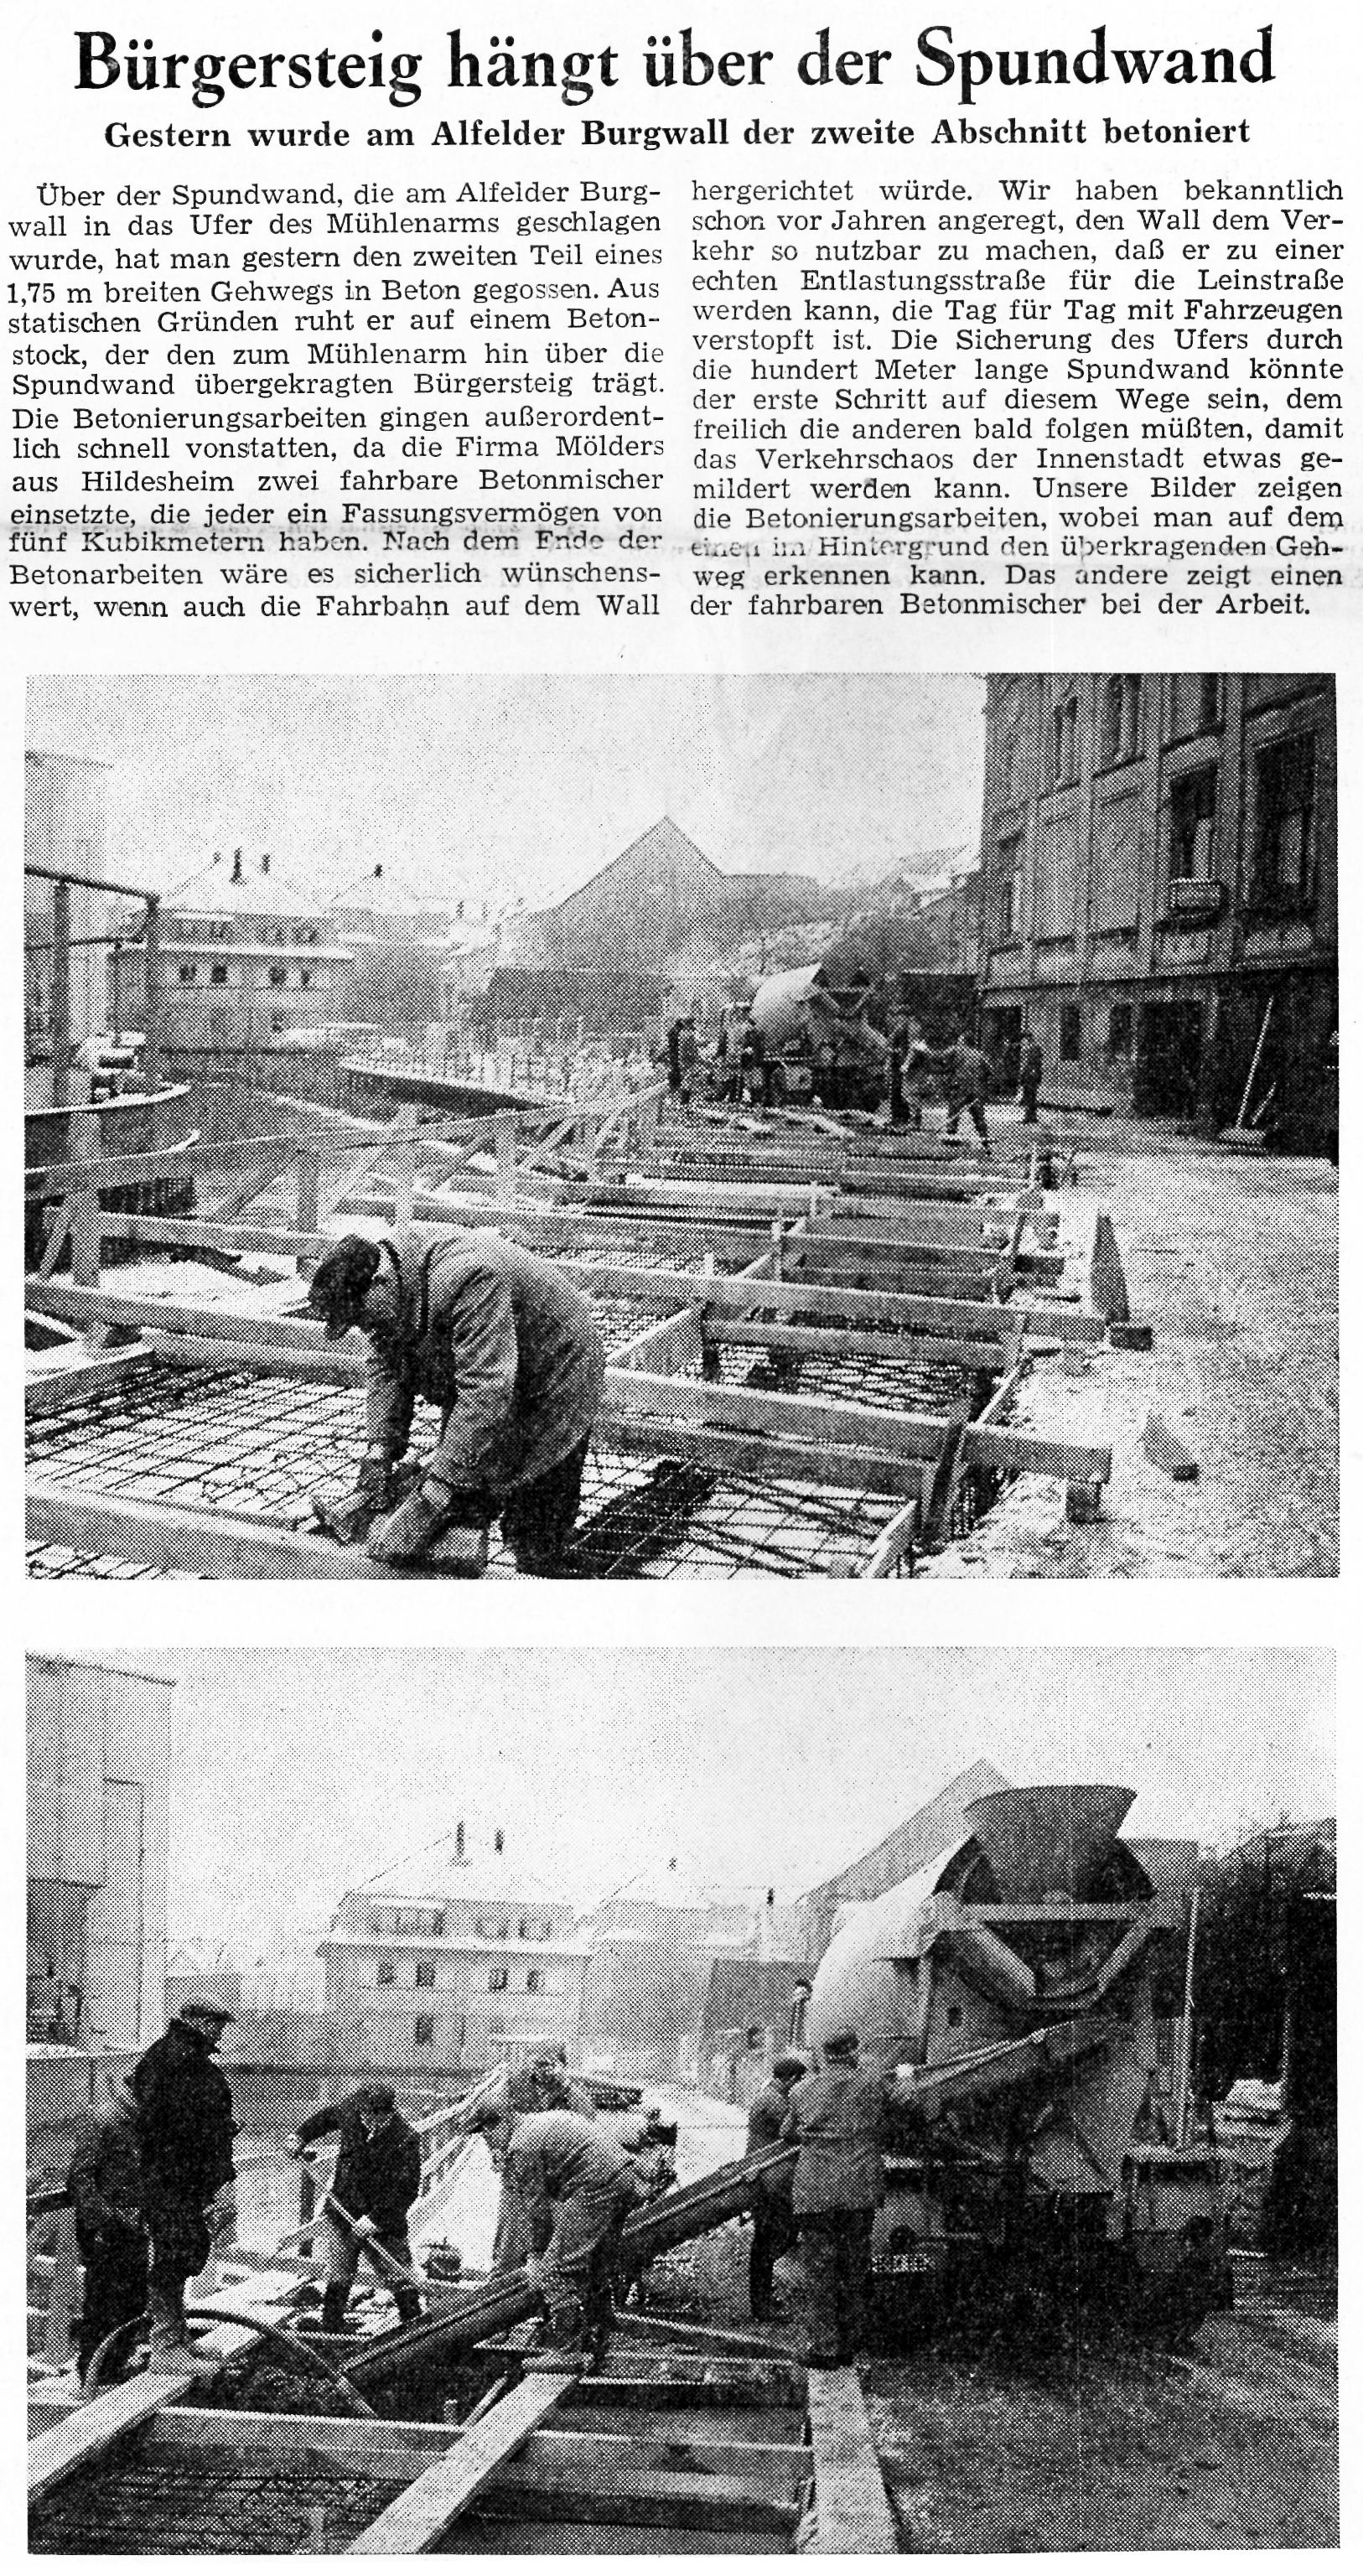 AZ vom 29.01.1965-Perkwall-Bau Bürgersteig Spundwand